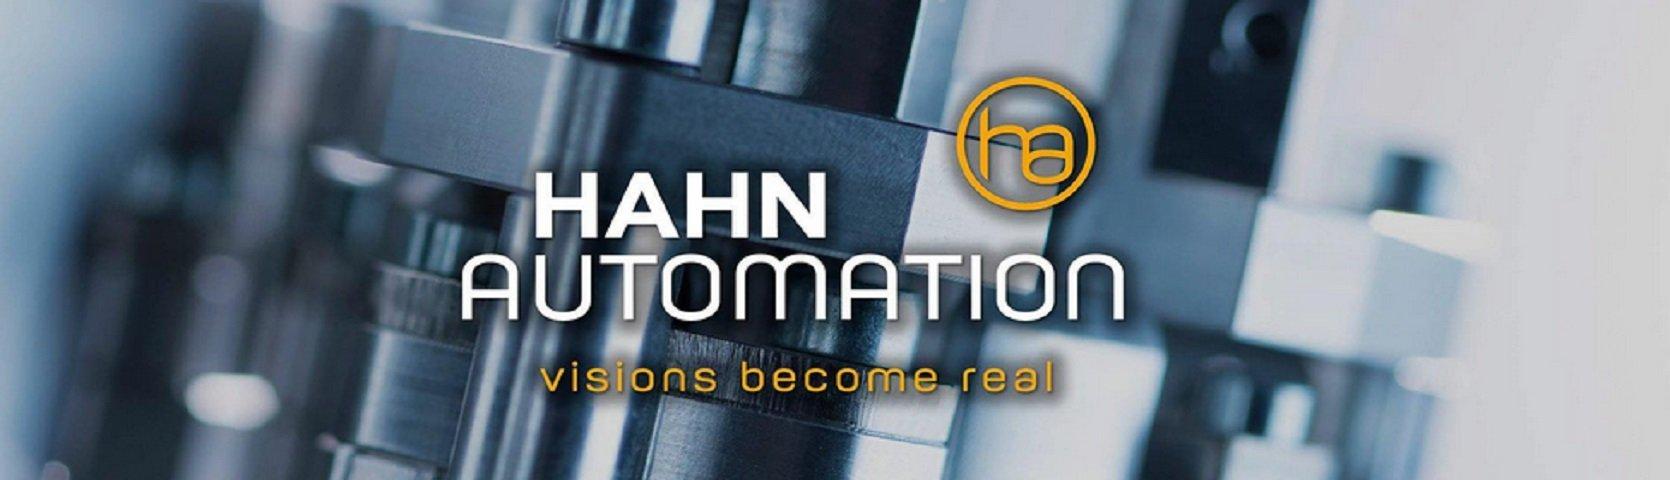 HAHN Automation GmbH